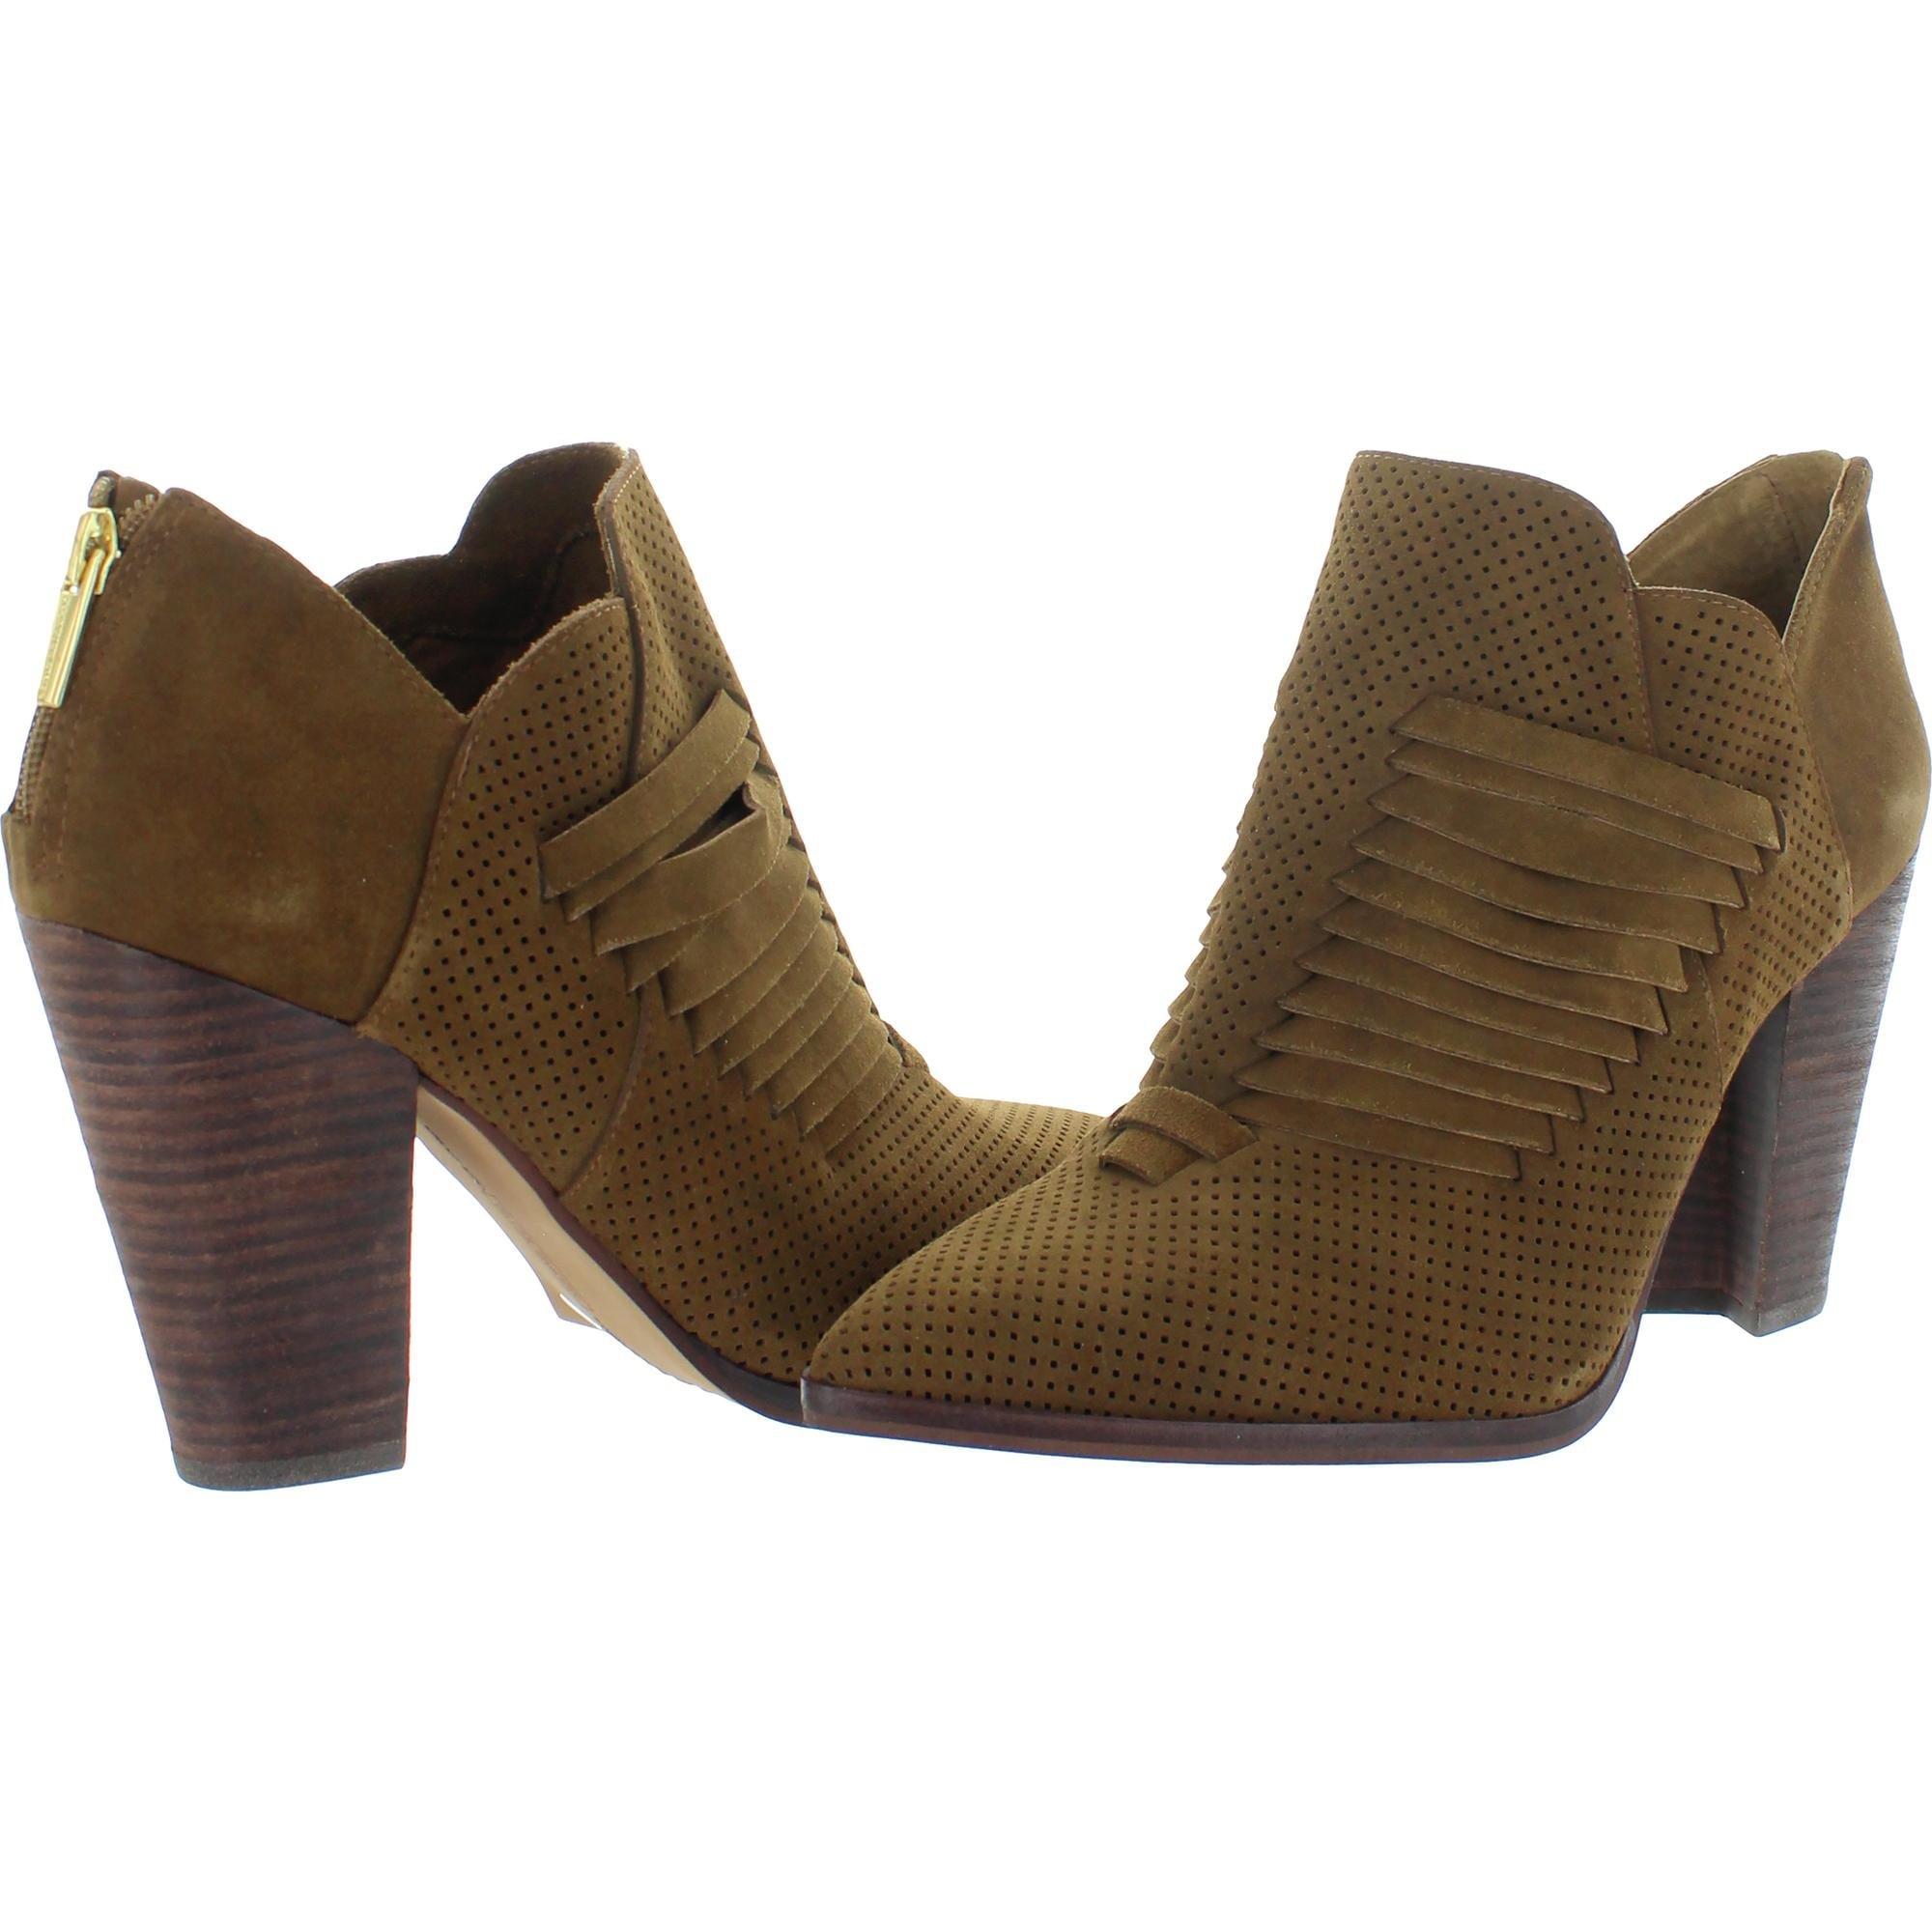 Vince Camuto Levana Women/'s Woven Stacked Block Heel Ankle Bootie